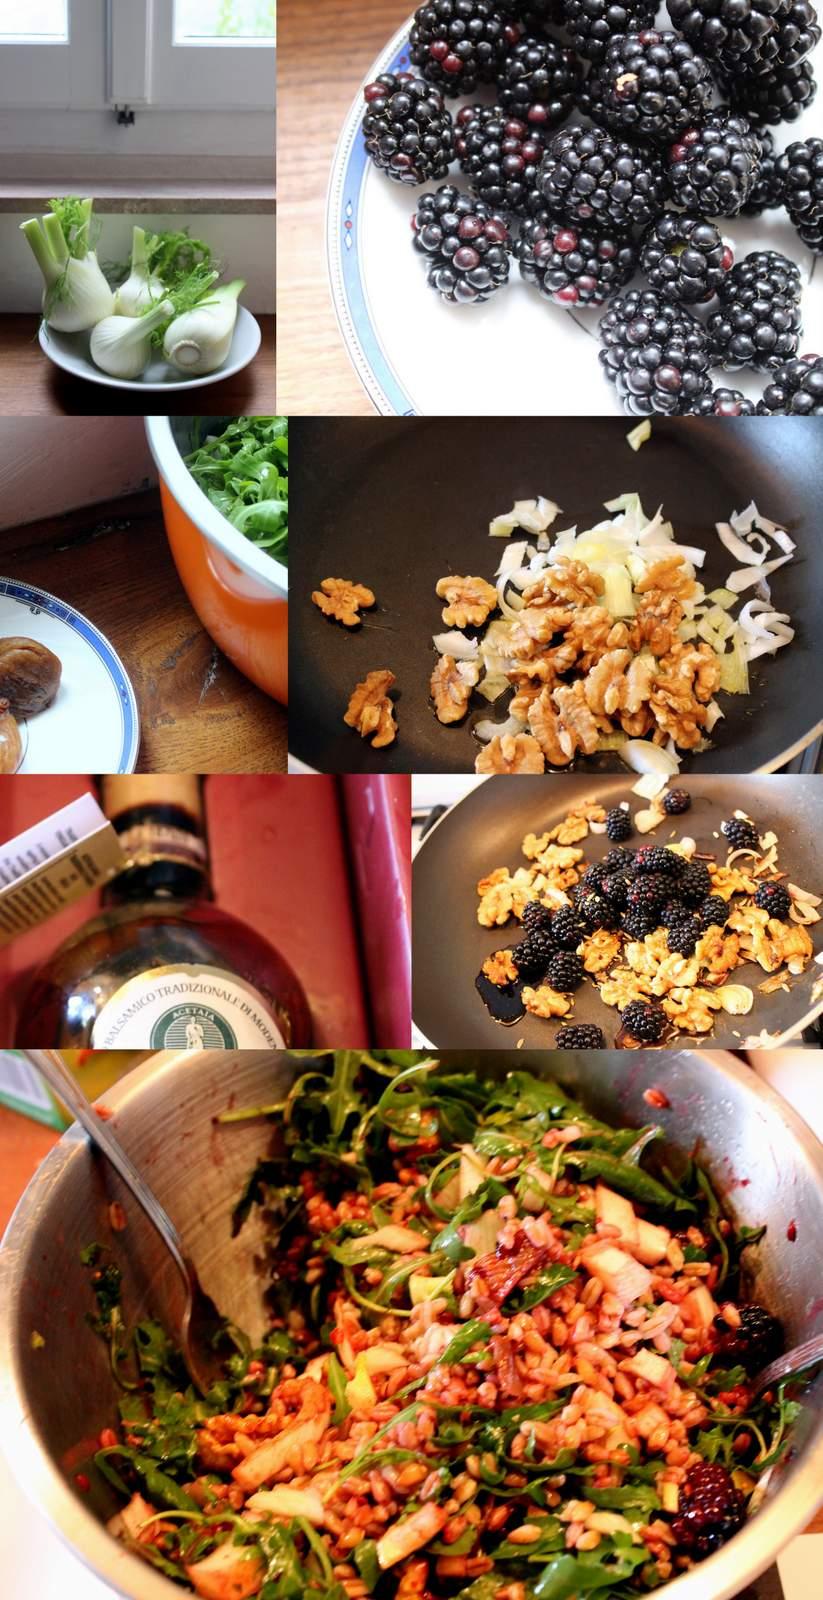 Vergan, veggie, gluten free salad Farro salad with blackberry, fig, fennel and balsamico